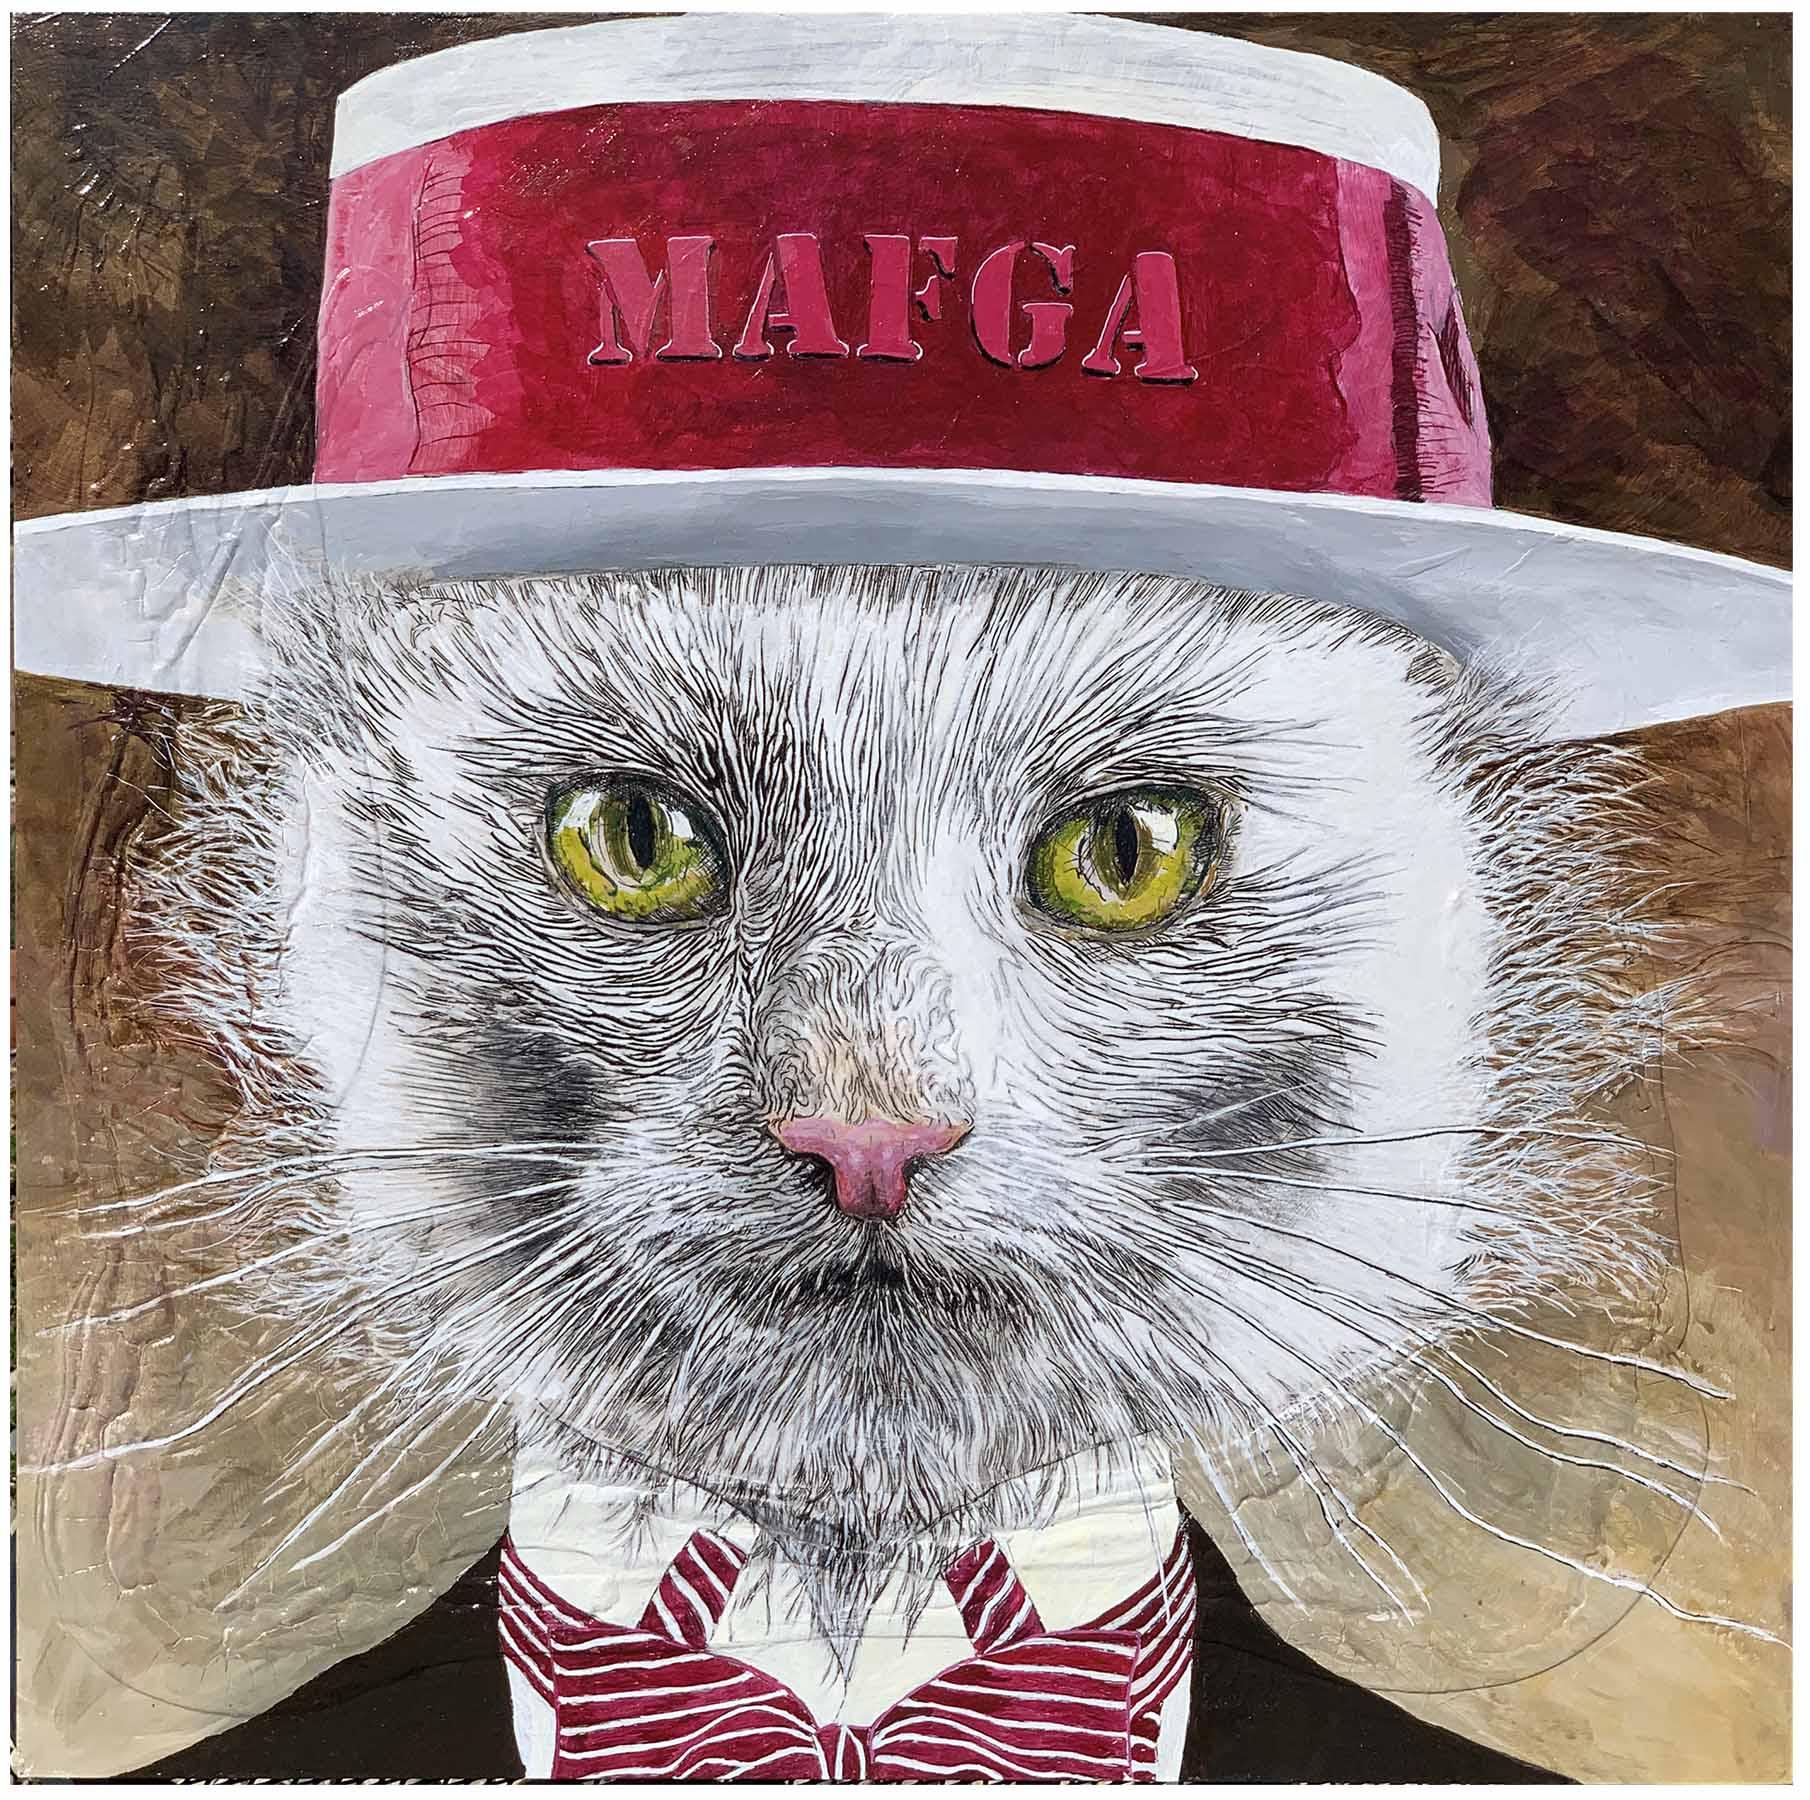 MAFGA_painting.jpg